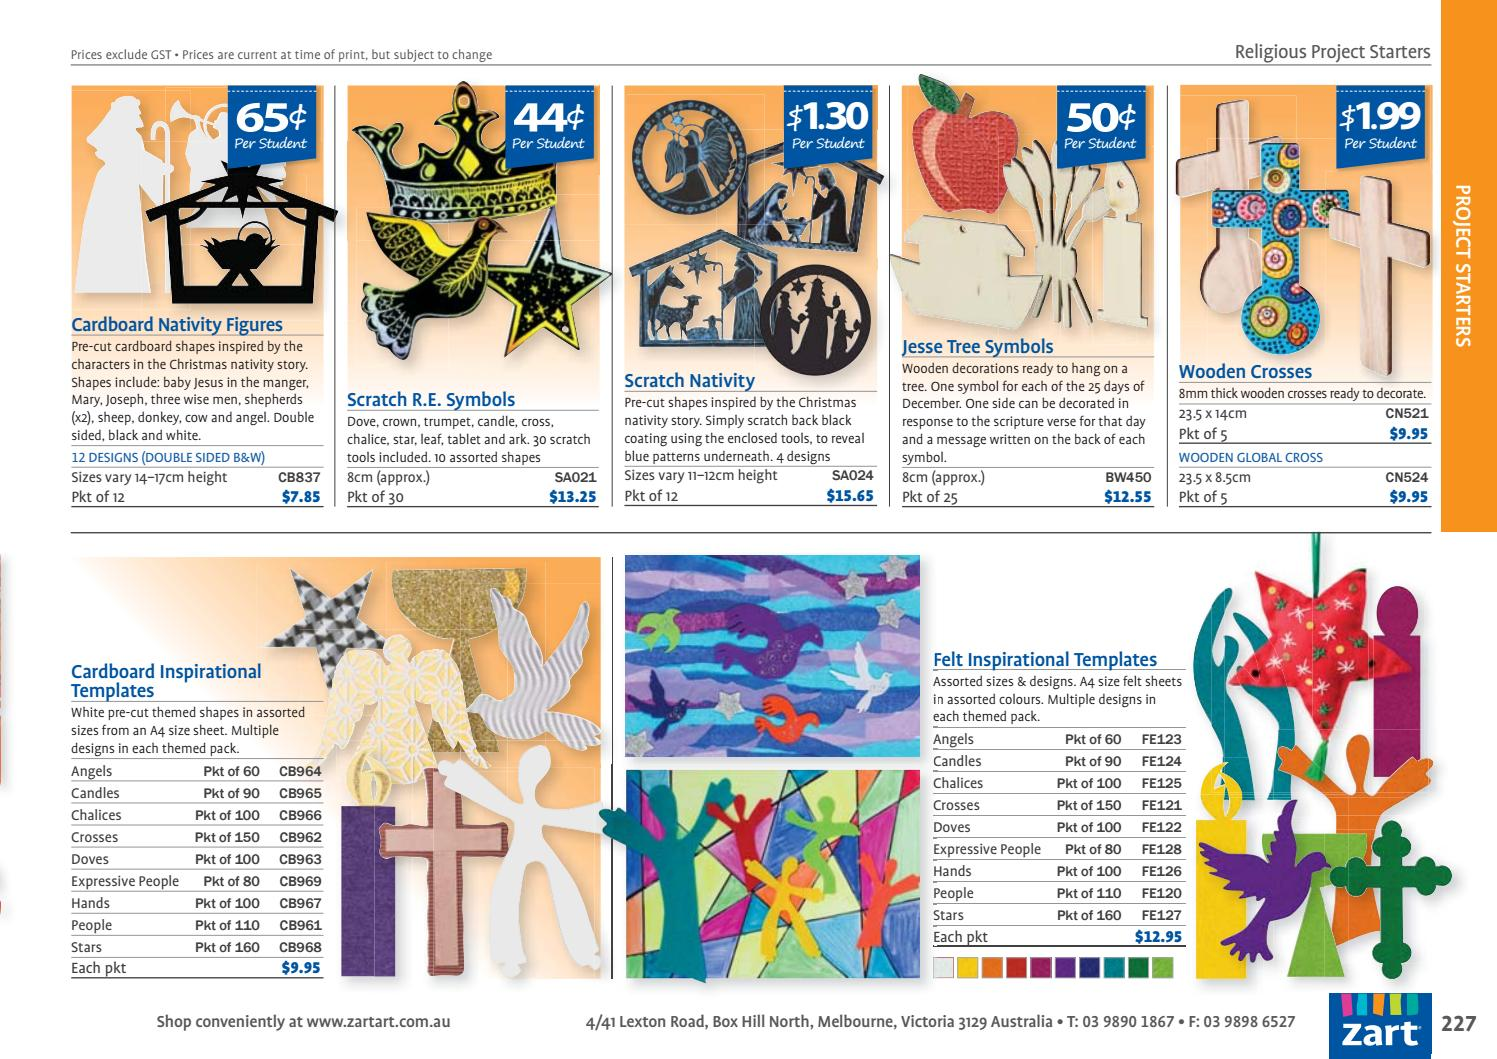 Zart School Catalogue 2017 by Zart : Art, craft and education